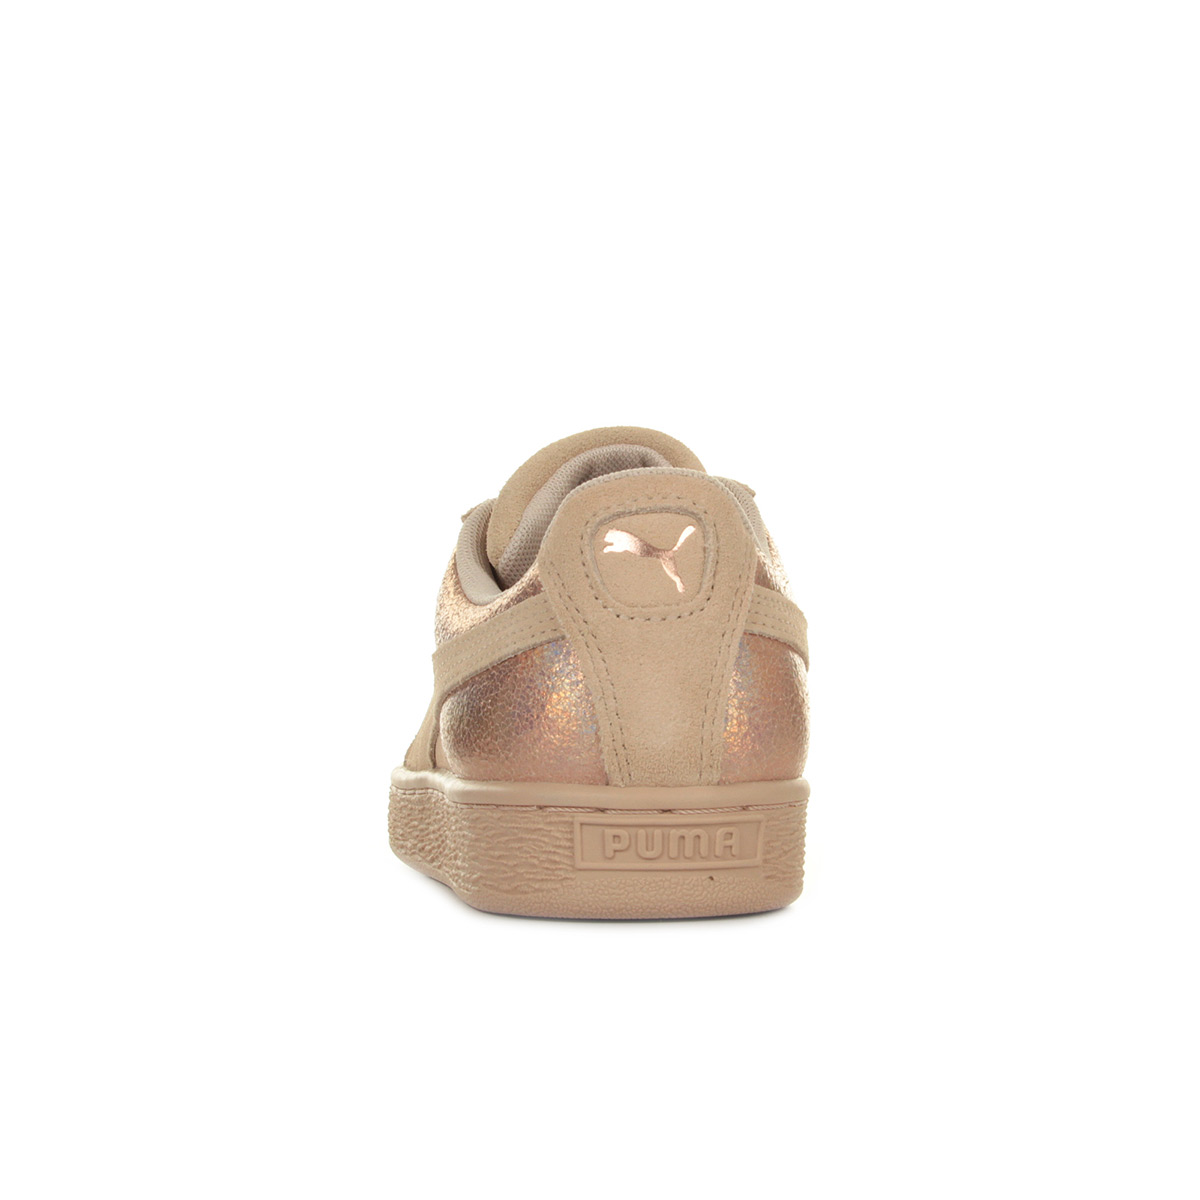 Puma Suede LunaLux Wn's 36611302, Baskets mode femme